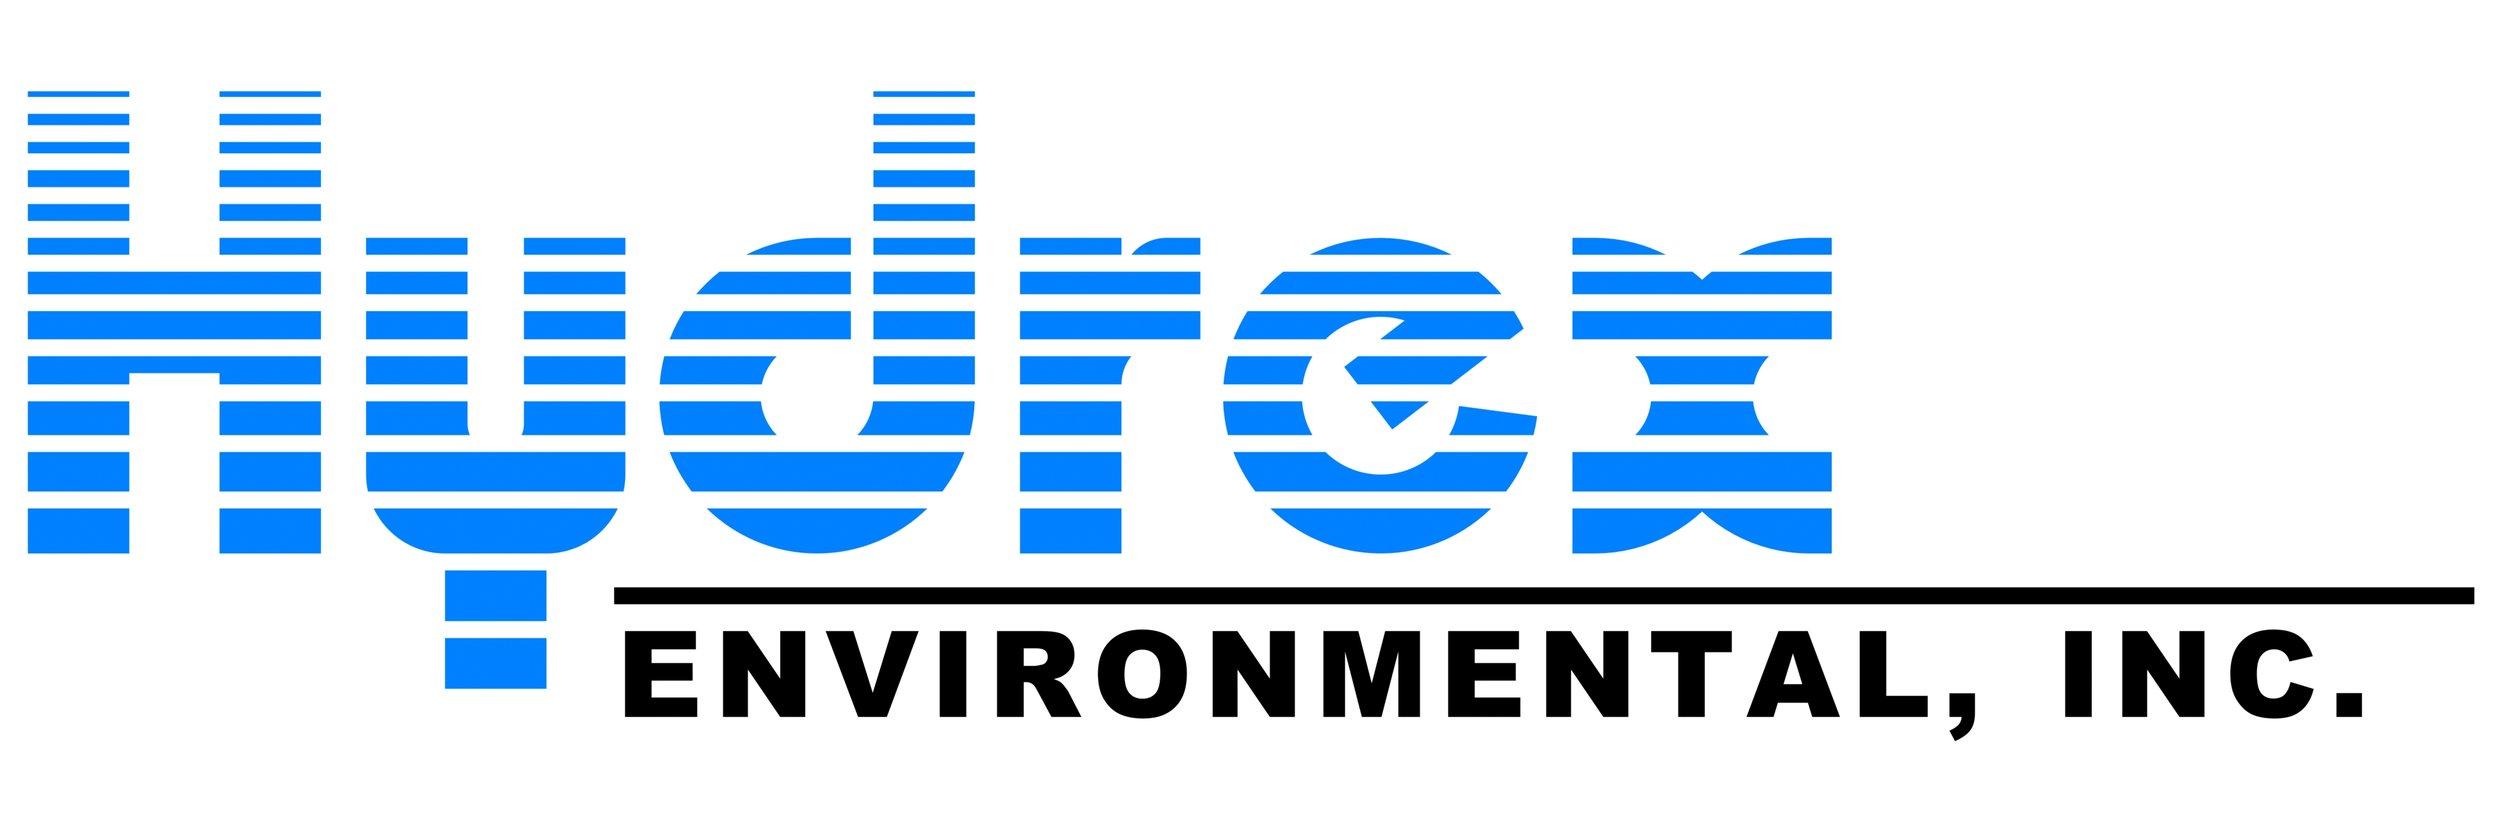 Hydrex environmental logo.jpeg